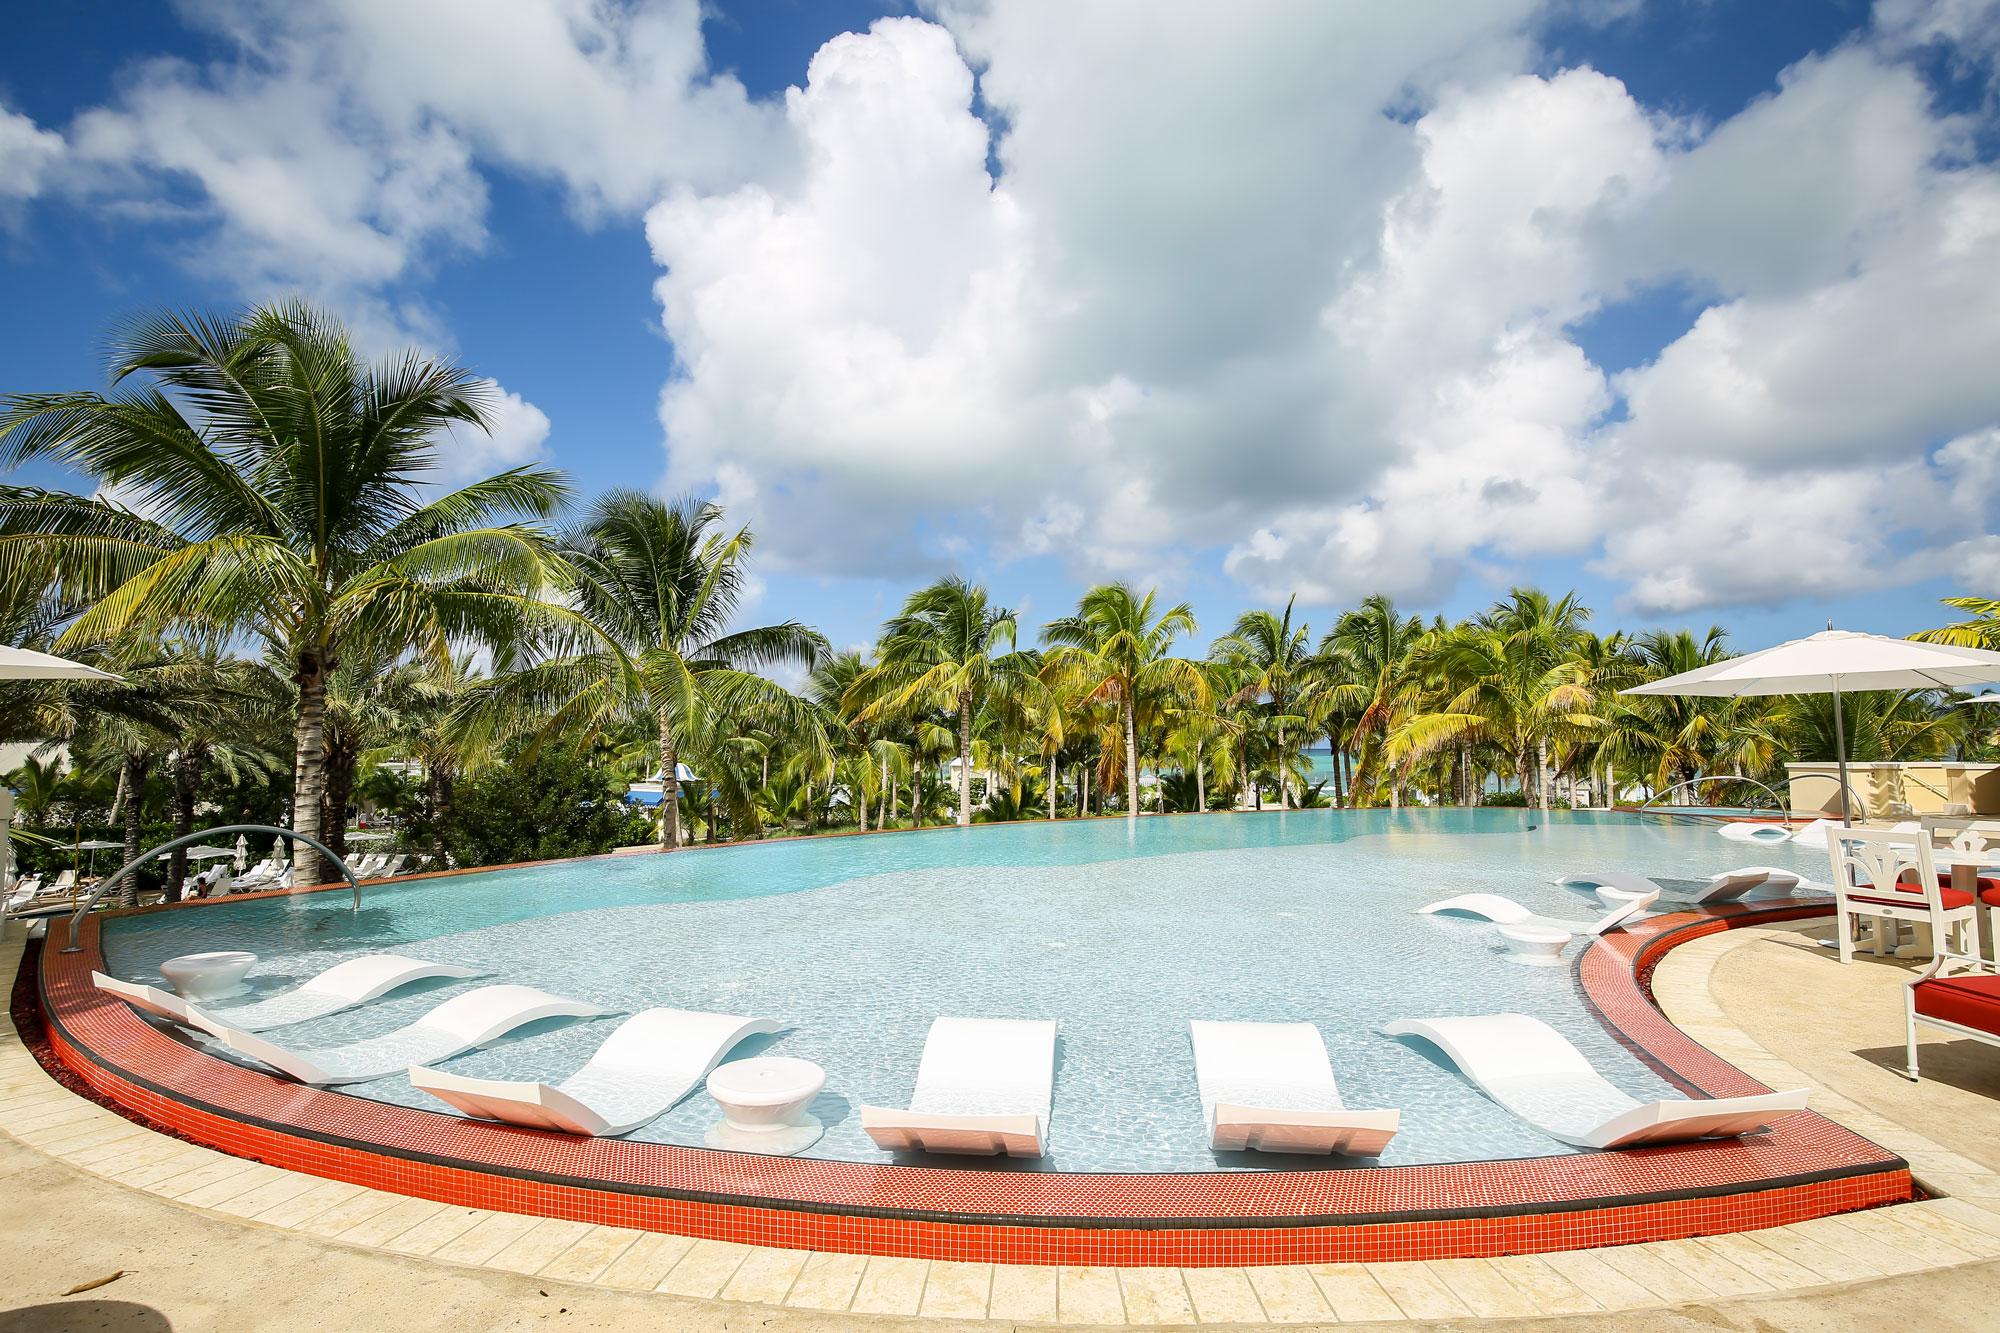 NEXUS Club Baha Mar Pool